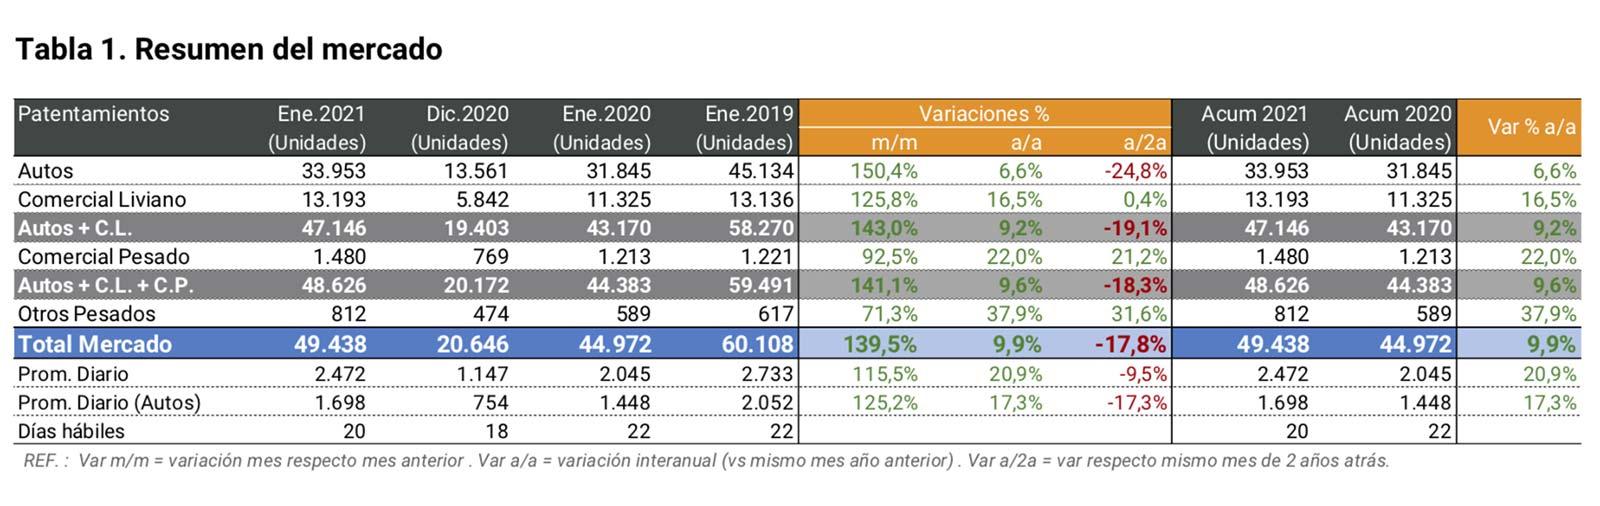 Patentamientos autos Argentina enero 2021